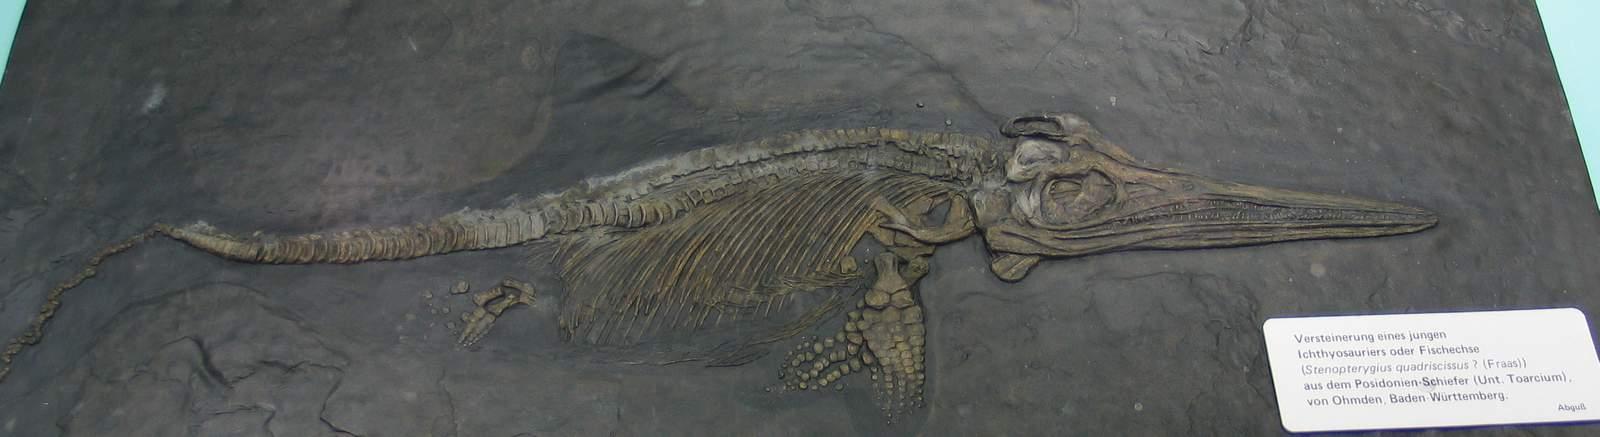 ichthyosaur fossil - photo #9